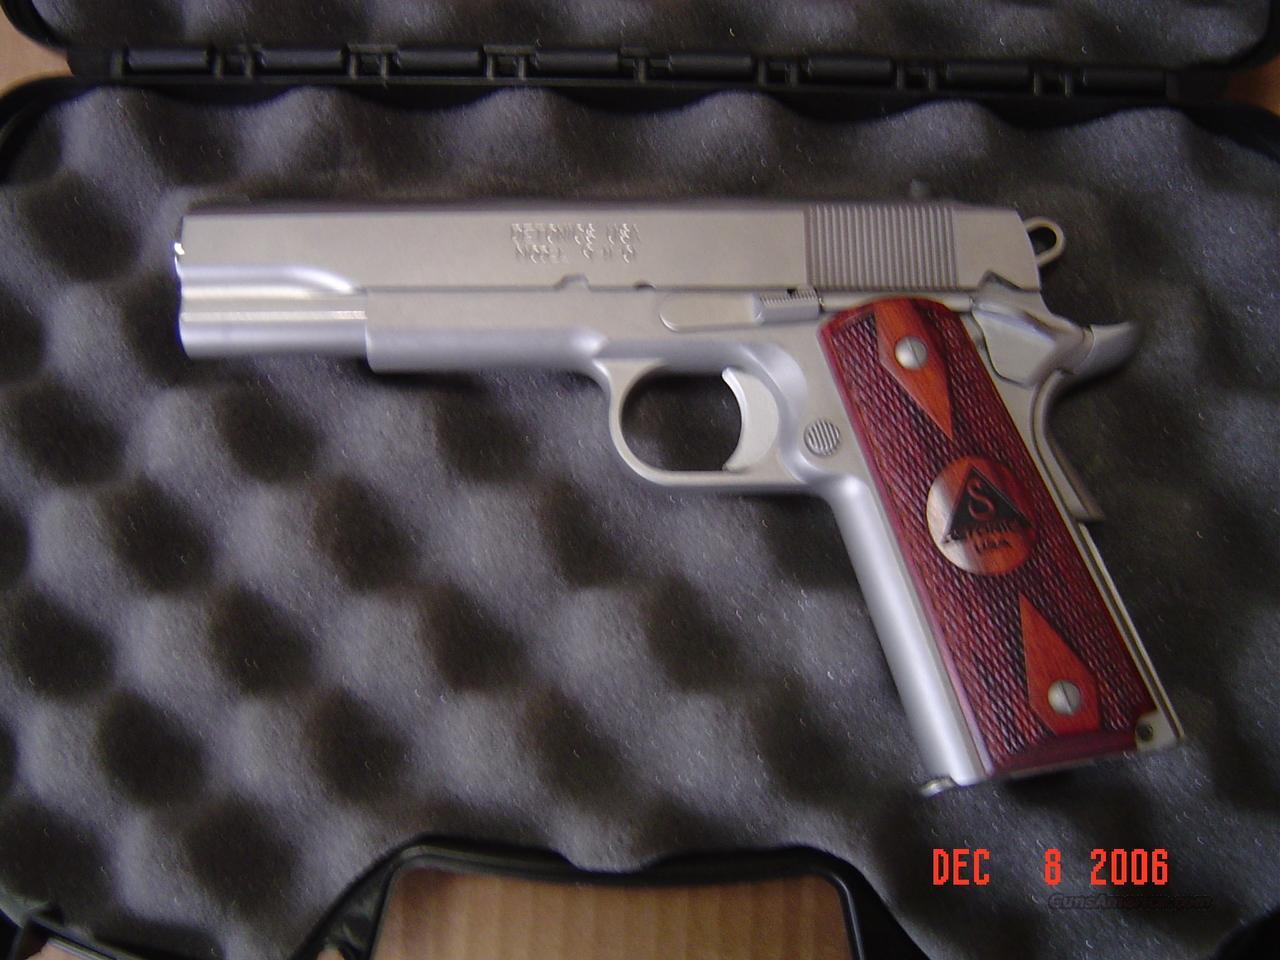 DETONICS 9-11-01 FULL SIZE 45  Guns > Pistols > 1911 Pistol Copies (non-Colt)